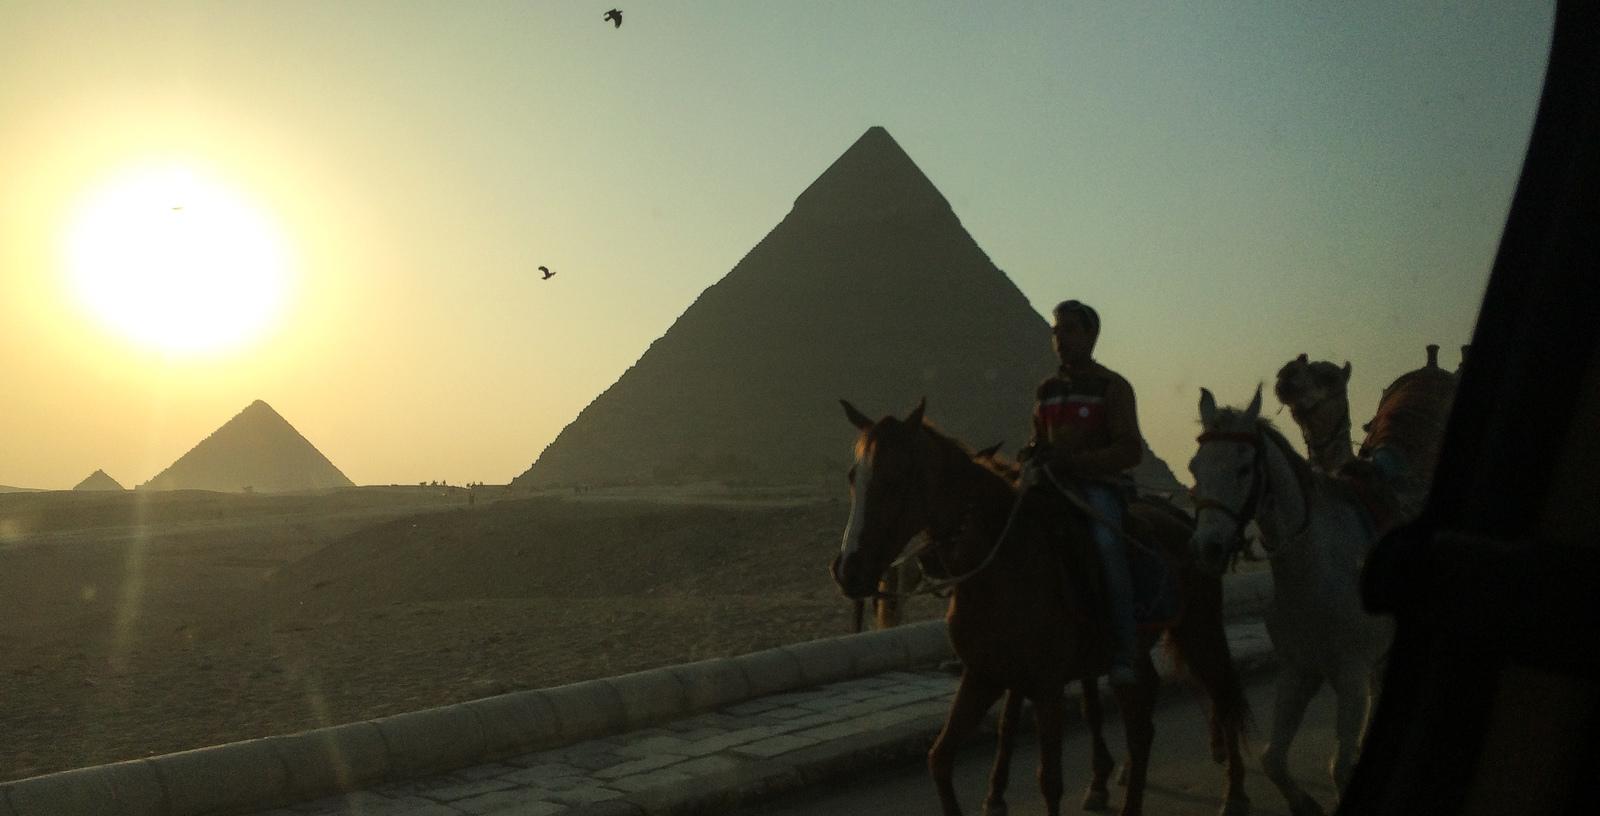 Les pyramides de Gizeh Pyramides de Gizeh